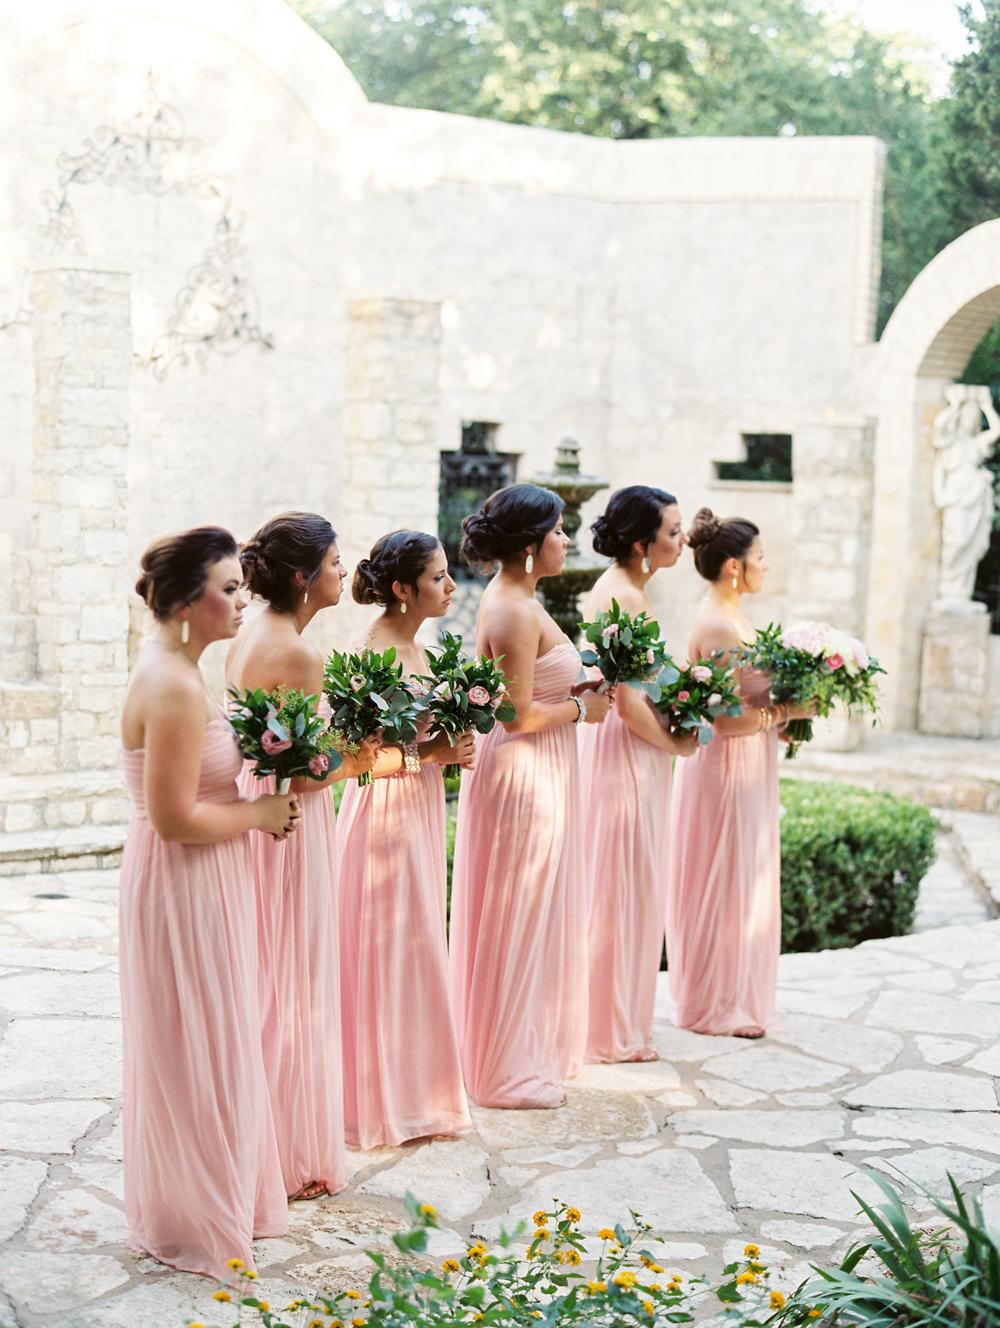 dana fernandez photography austin wedding photographer the vista on seward hill destination film-22.jpg